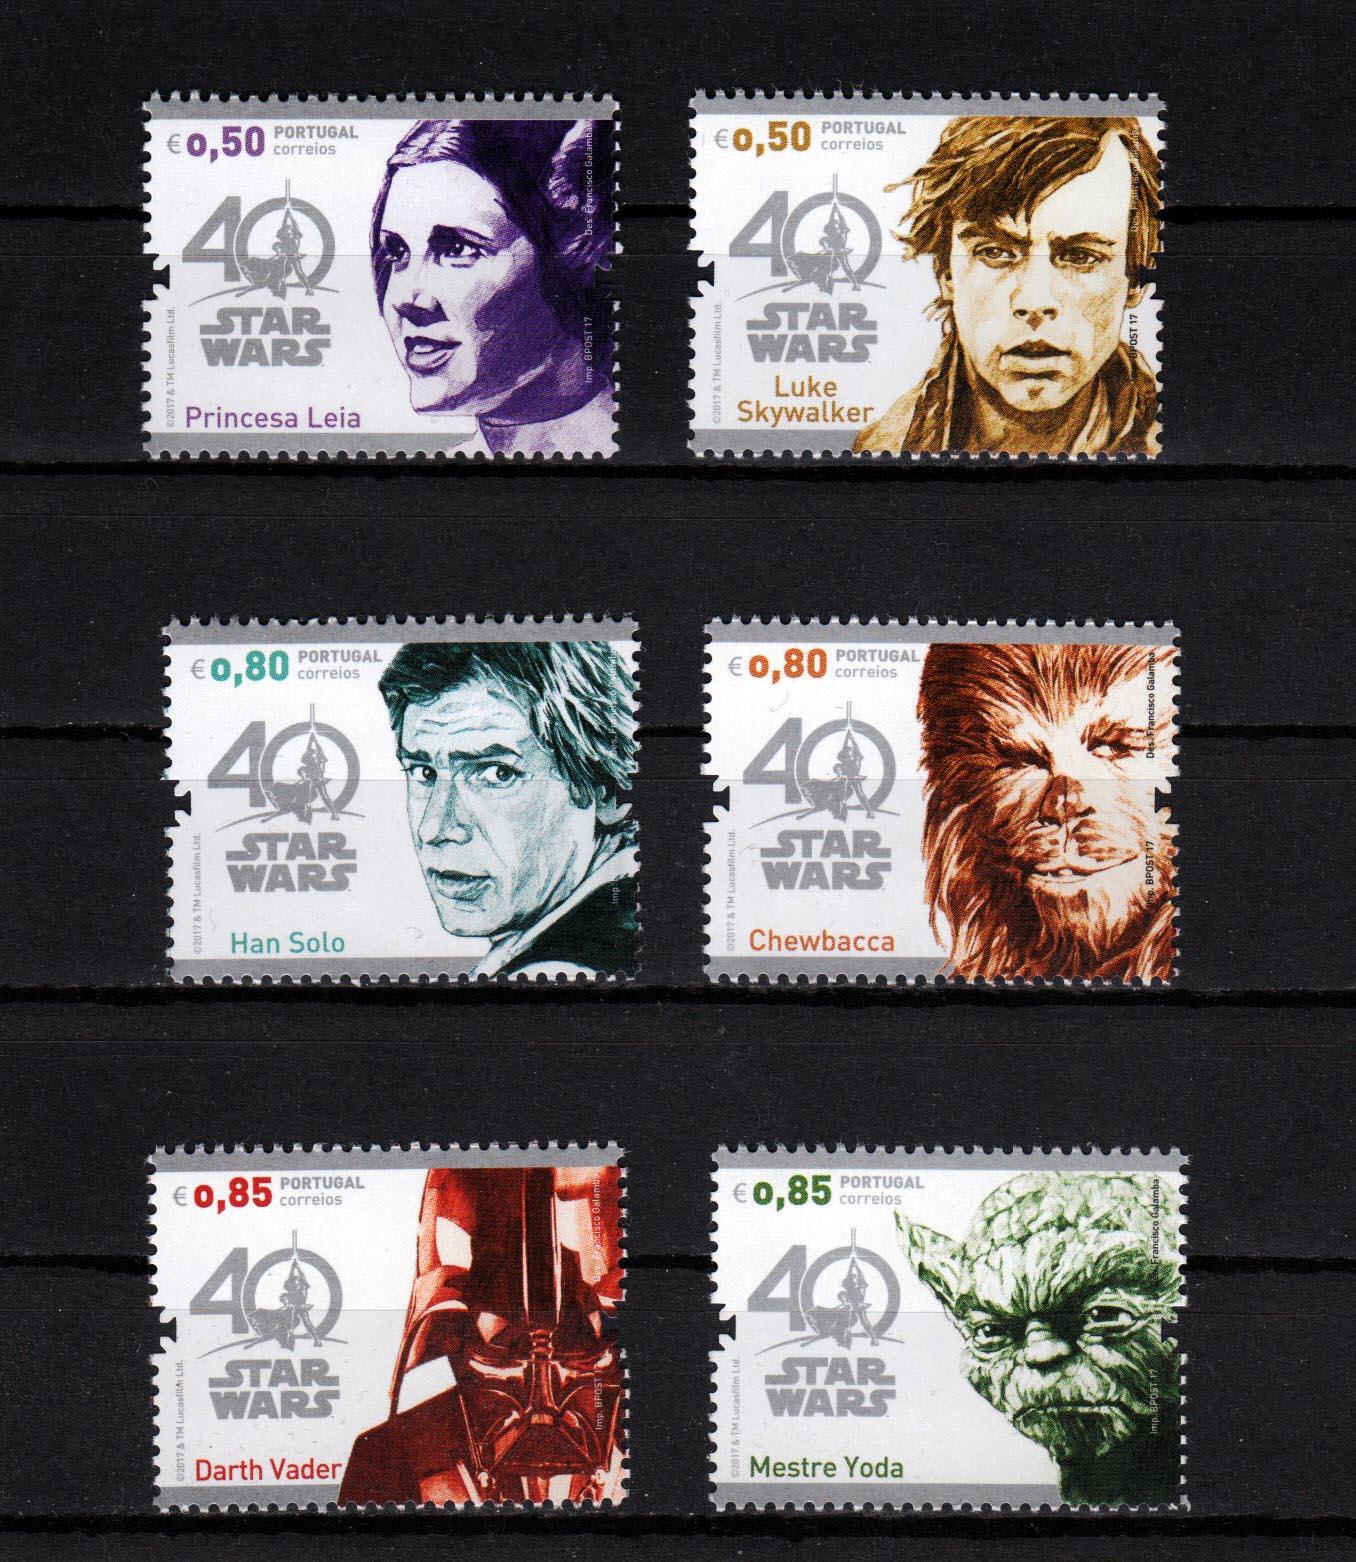 Brane Nina My Stamp Order From Portugal